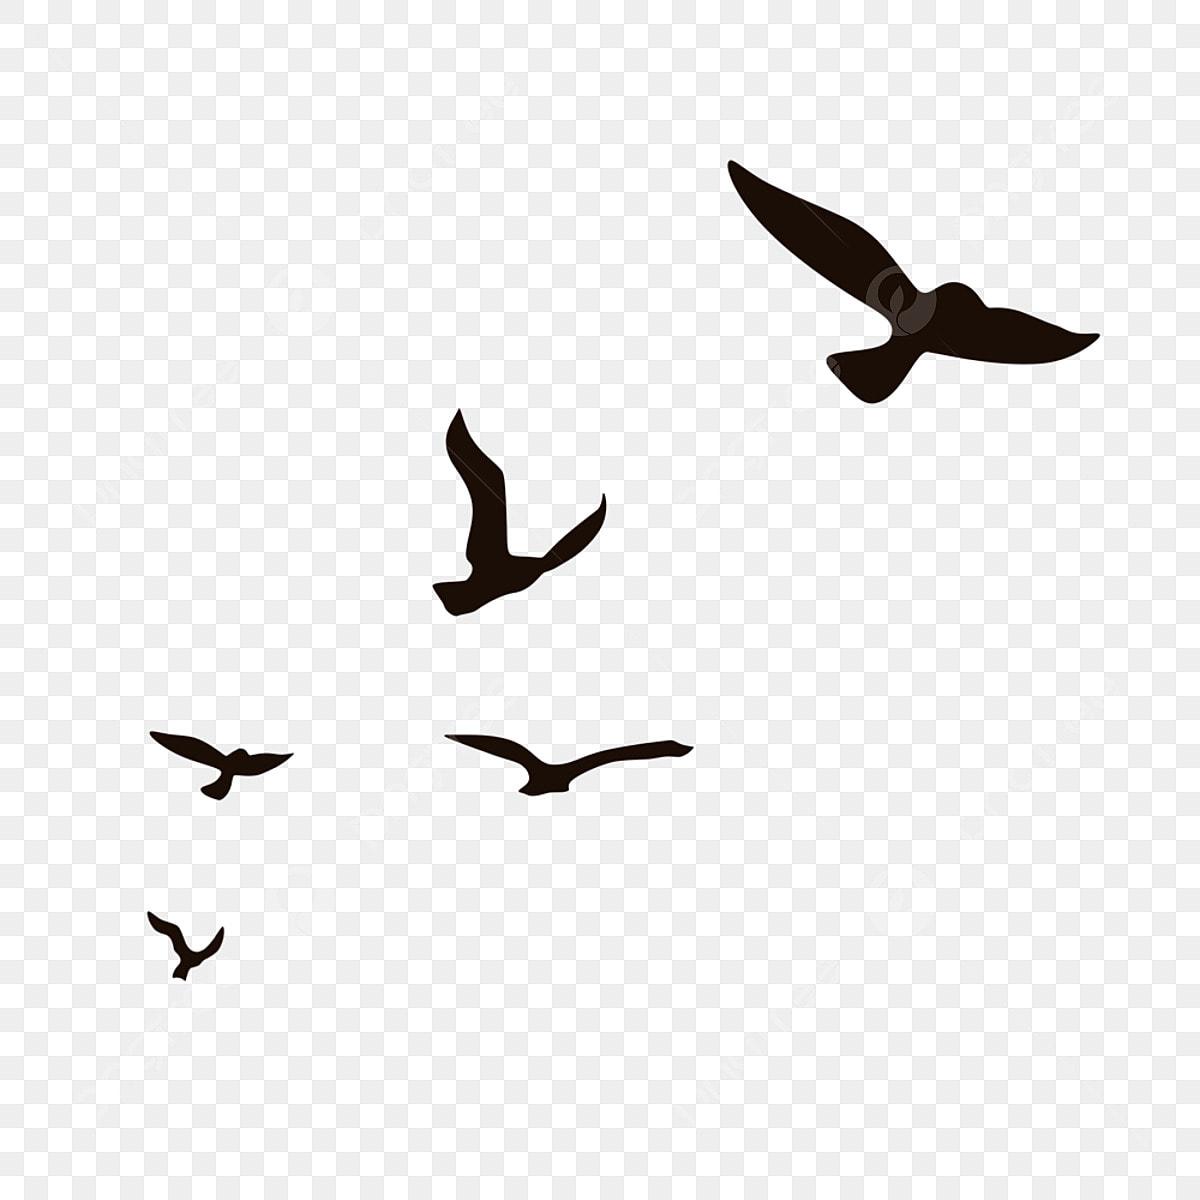 Terbang Siluet Burung Kecil Terbang Kawanan Burung Camar